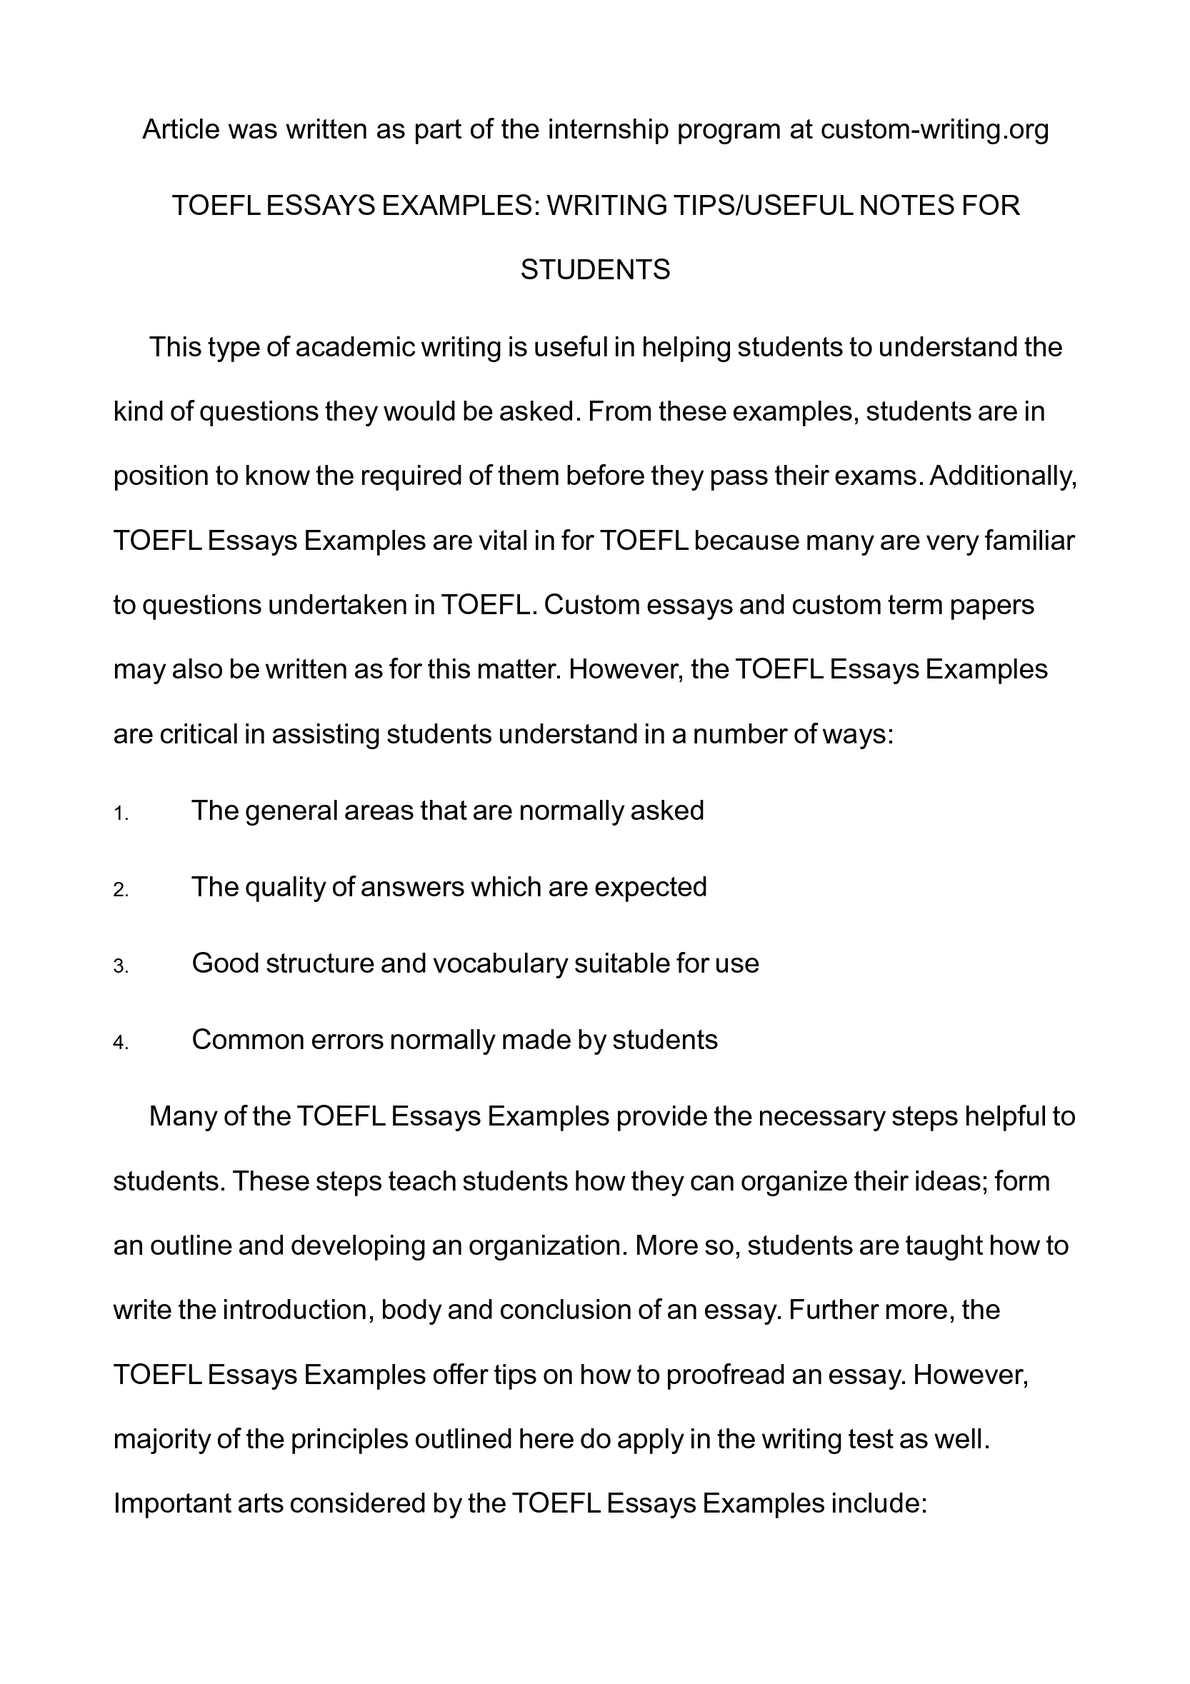 toefl essay writing examples